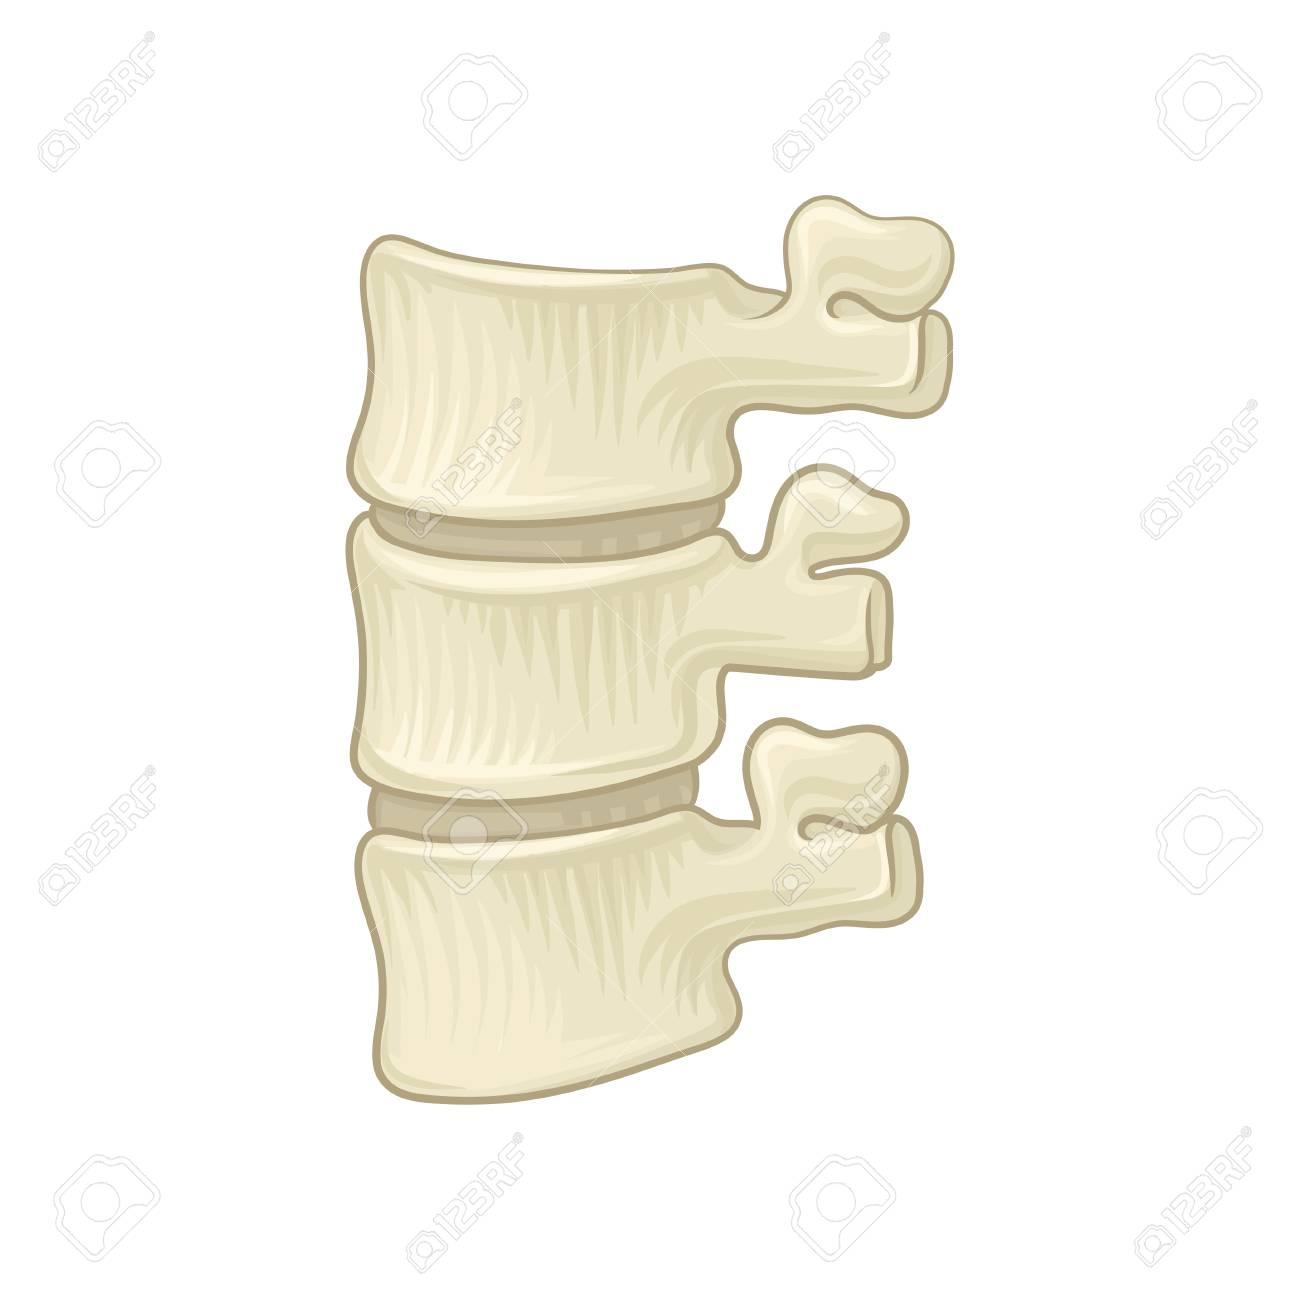 Anatomy Of Lumbar Spine. Part Of Human Backbone. Vertebral Bones ...